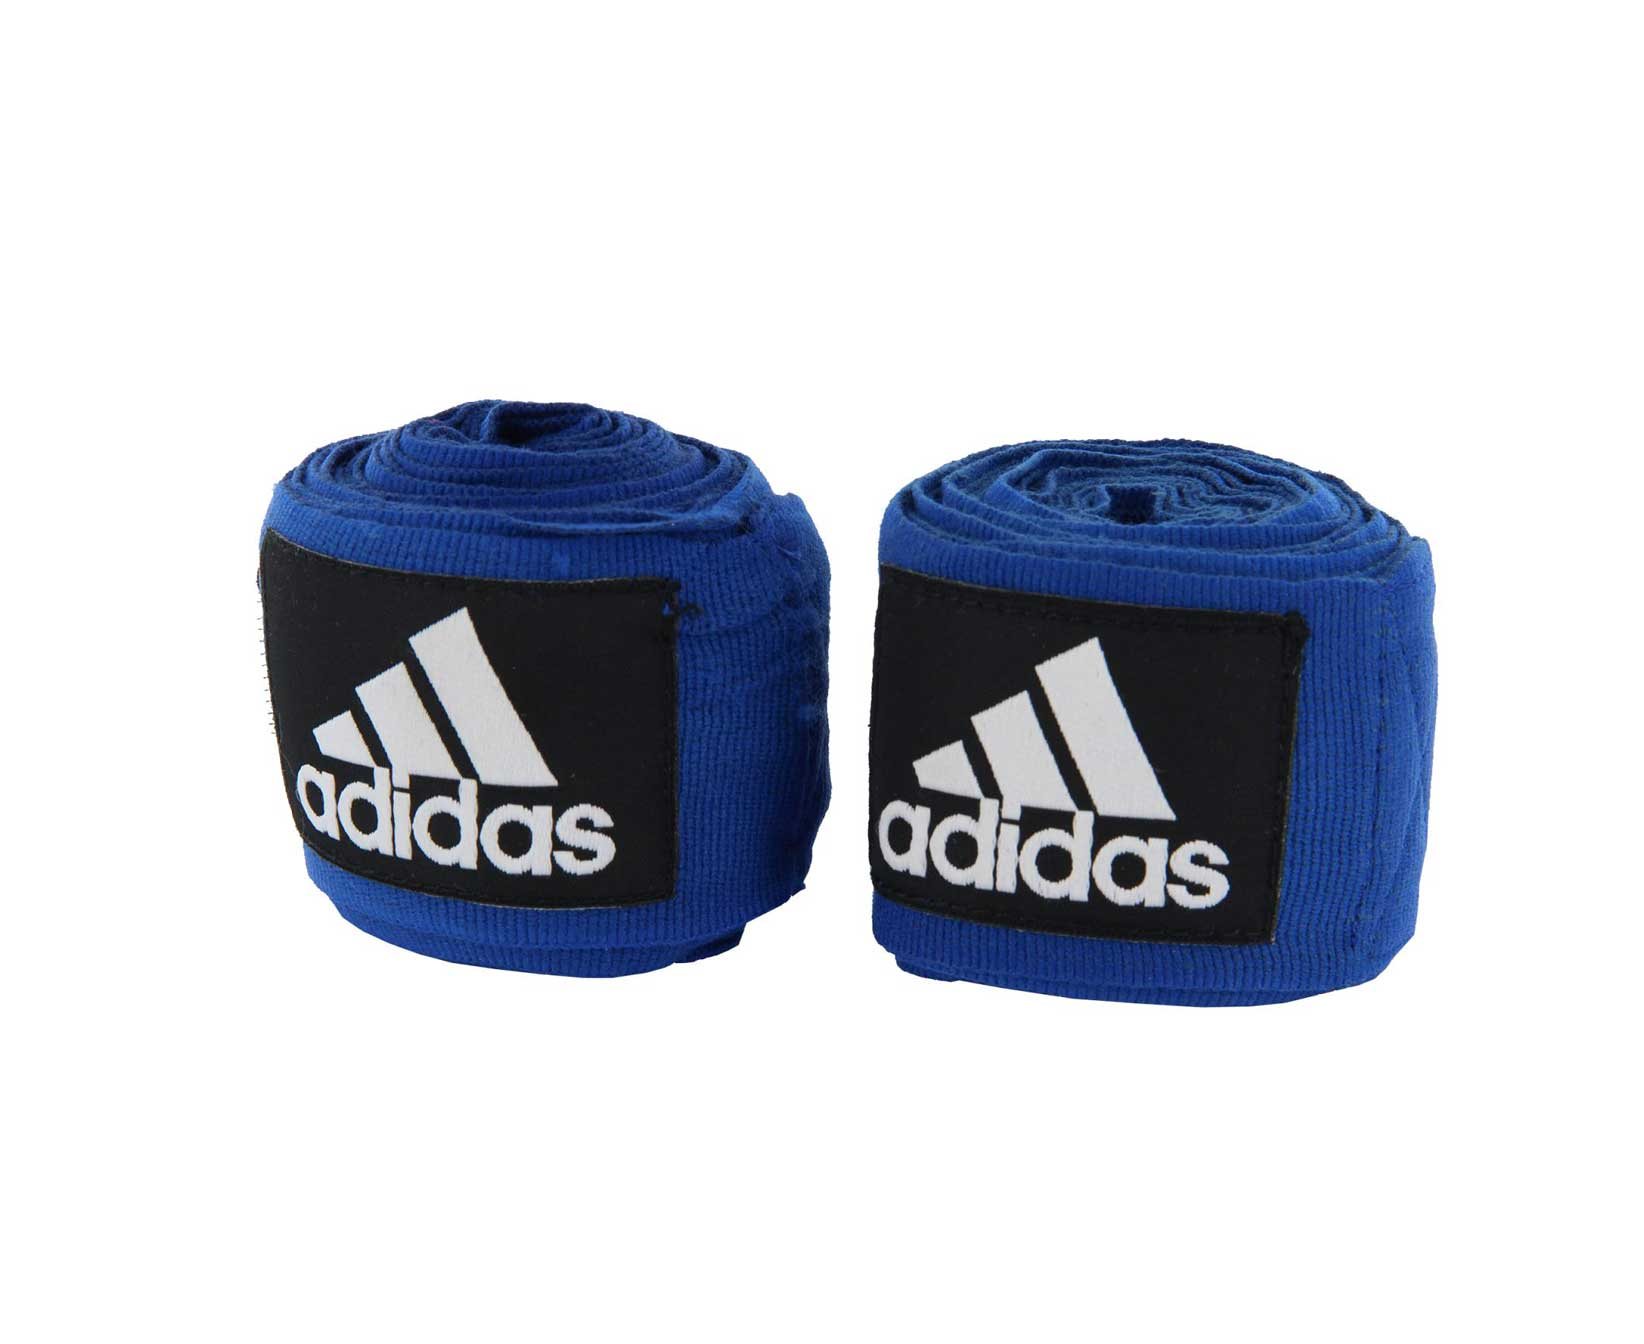 Бинт эластичный Adidas Boxing Crepe Bandage синий